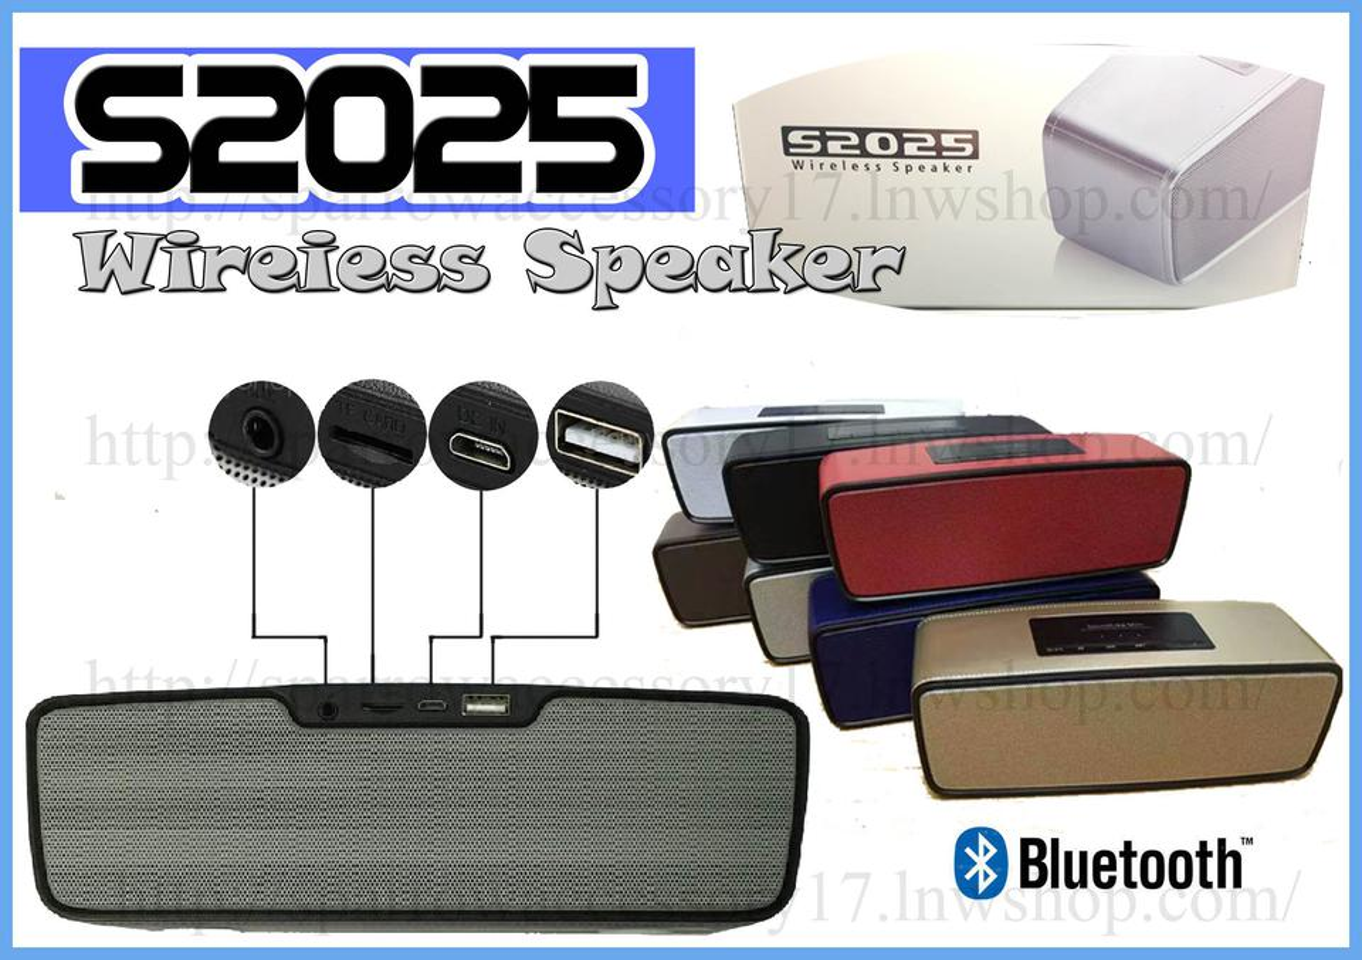 Bose Soundlink Mini - S2025 สินค้าไม่ใช่ของแท้ รูปที่ 1